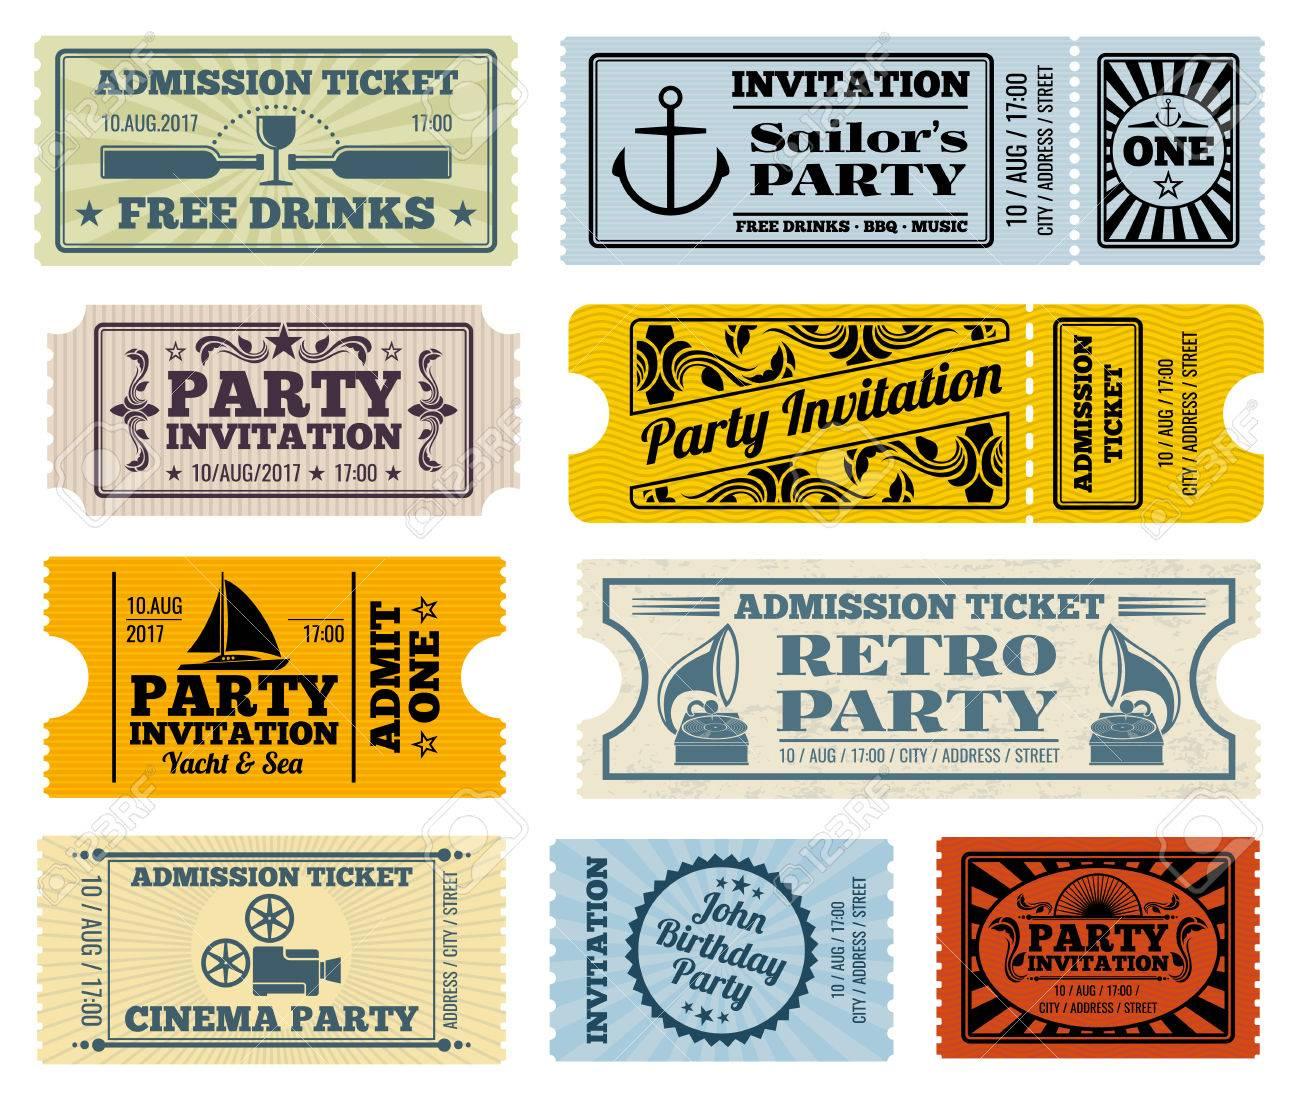 Kinoeinladung Einladung Kino